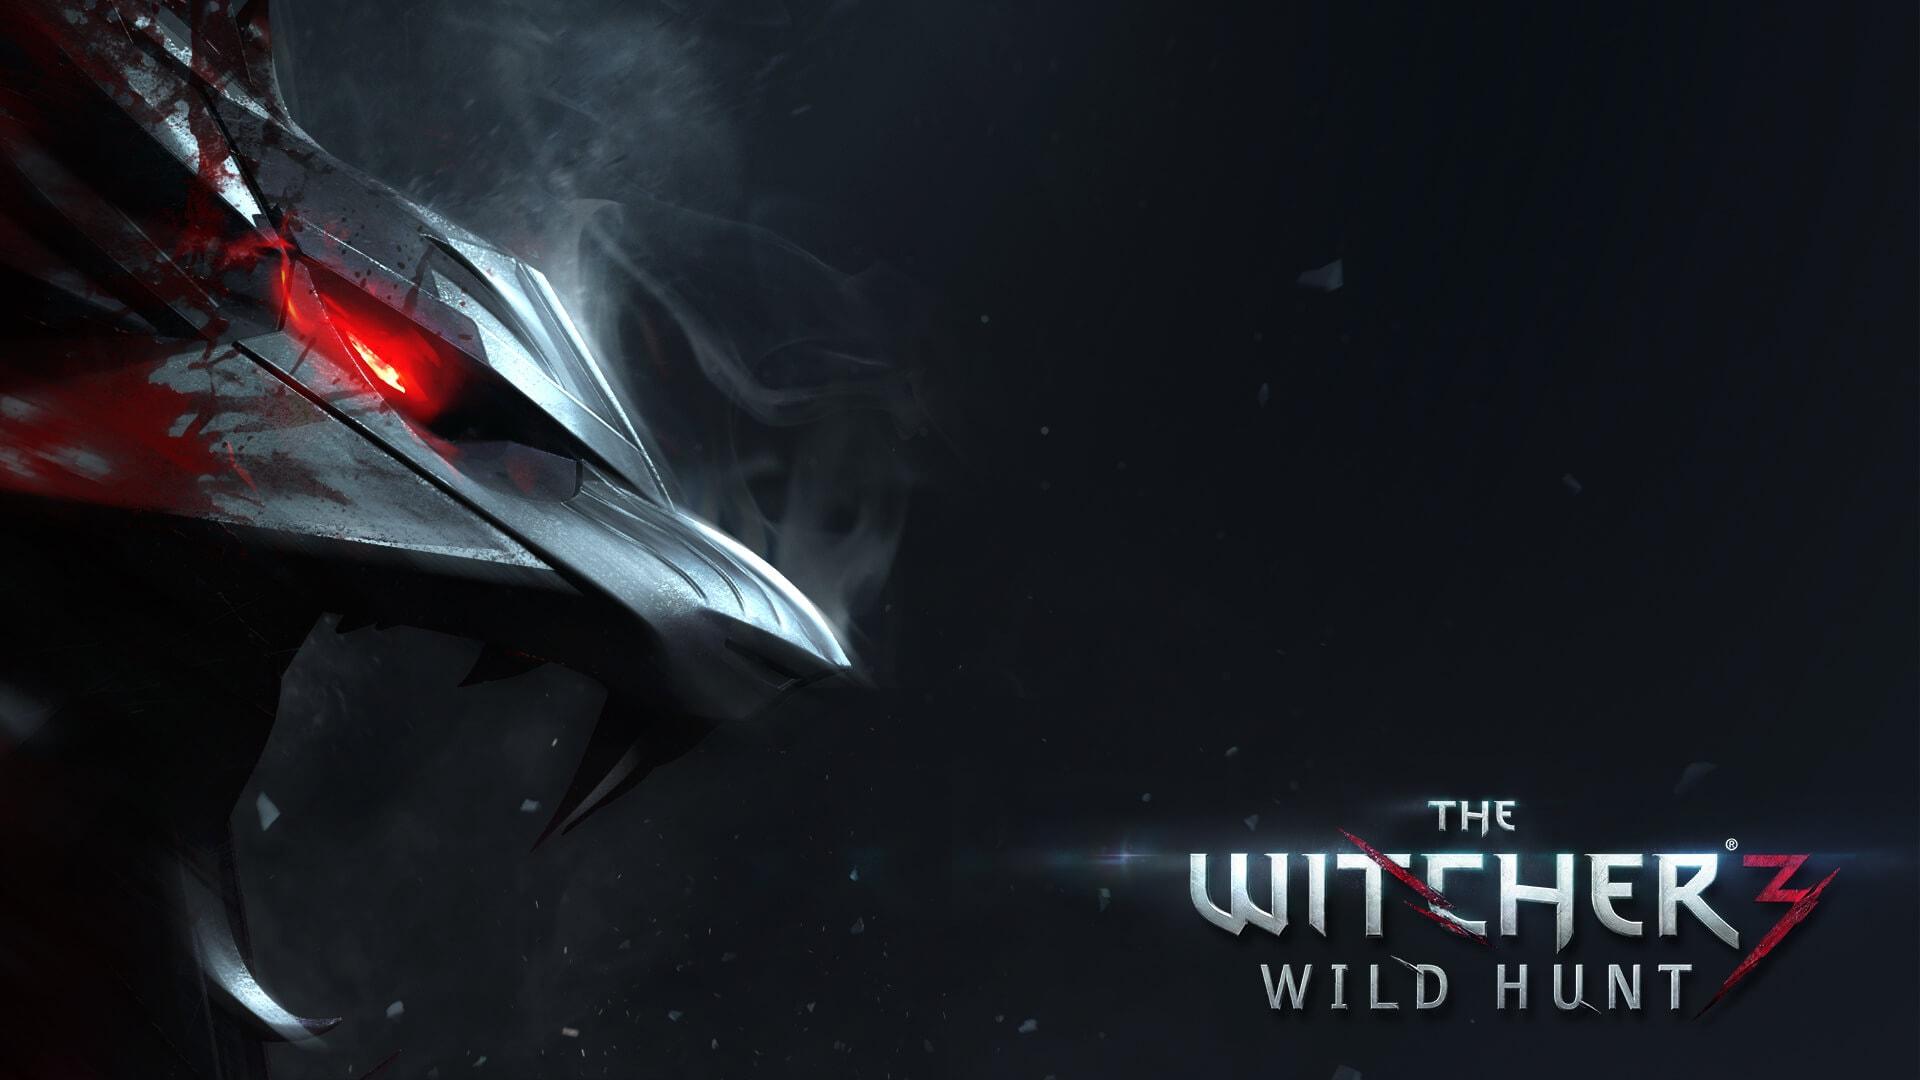 The Witcher 3: Wild Hunt 1080p Wolf Medallion Wallpaper